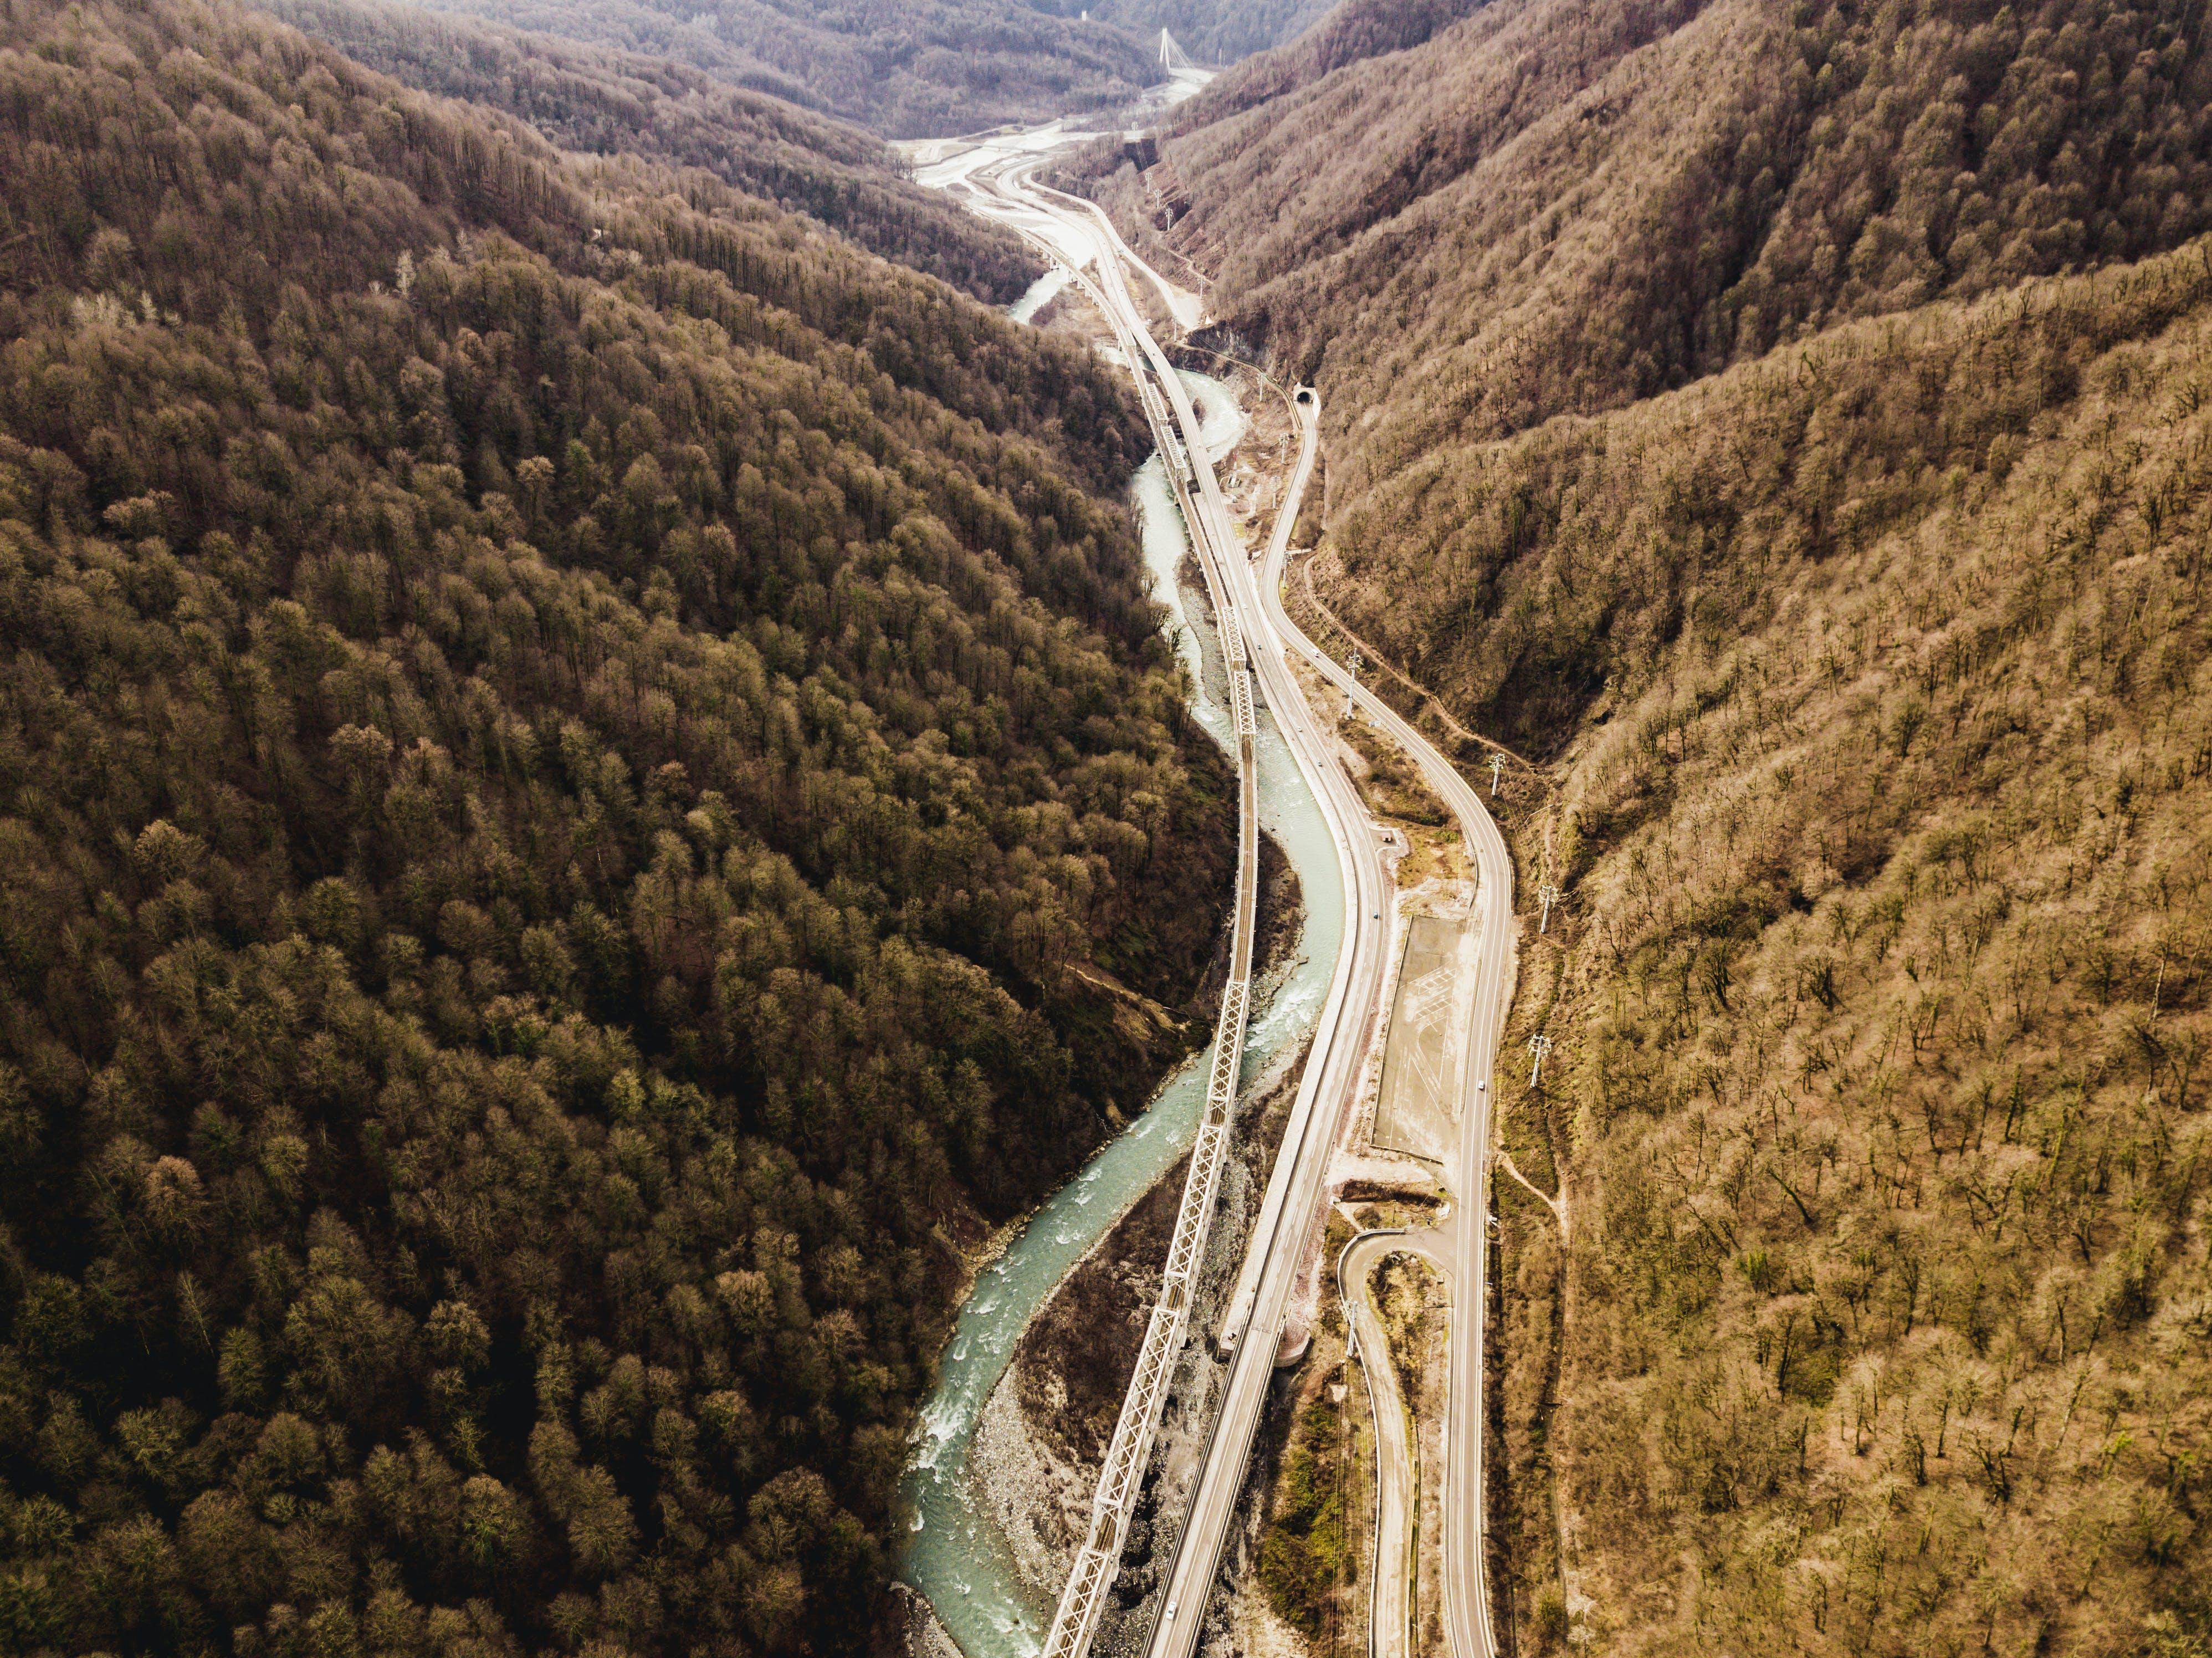 Aerial Photo of Freeway